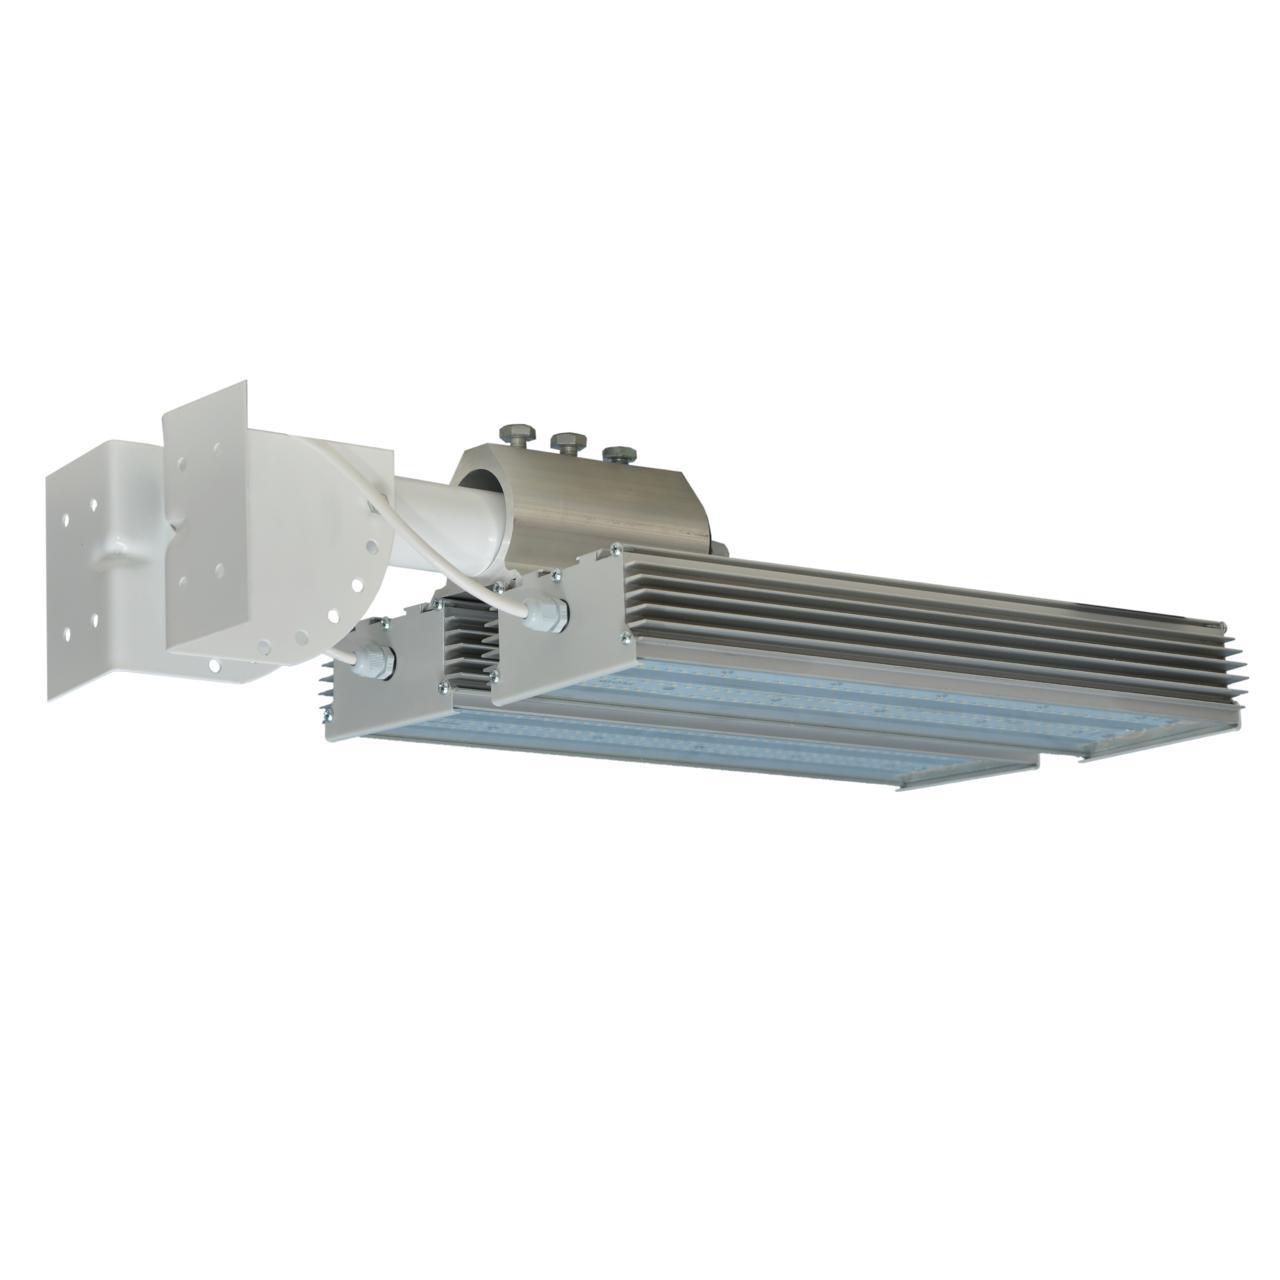 Уличный светодиодный светильник SKE PLO 150 Вт cons (2х80)